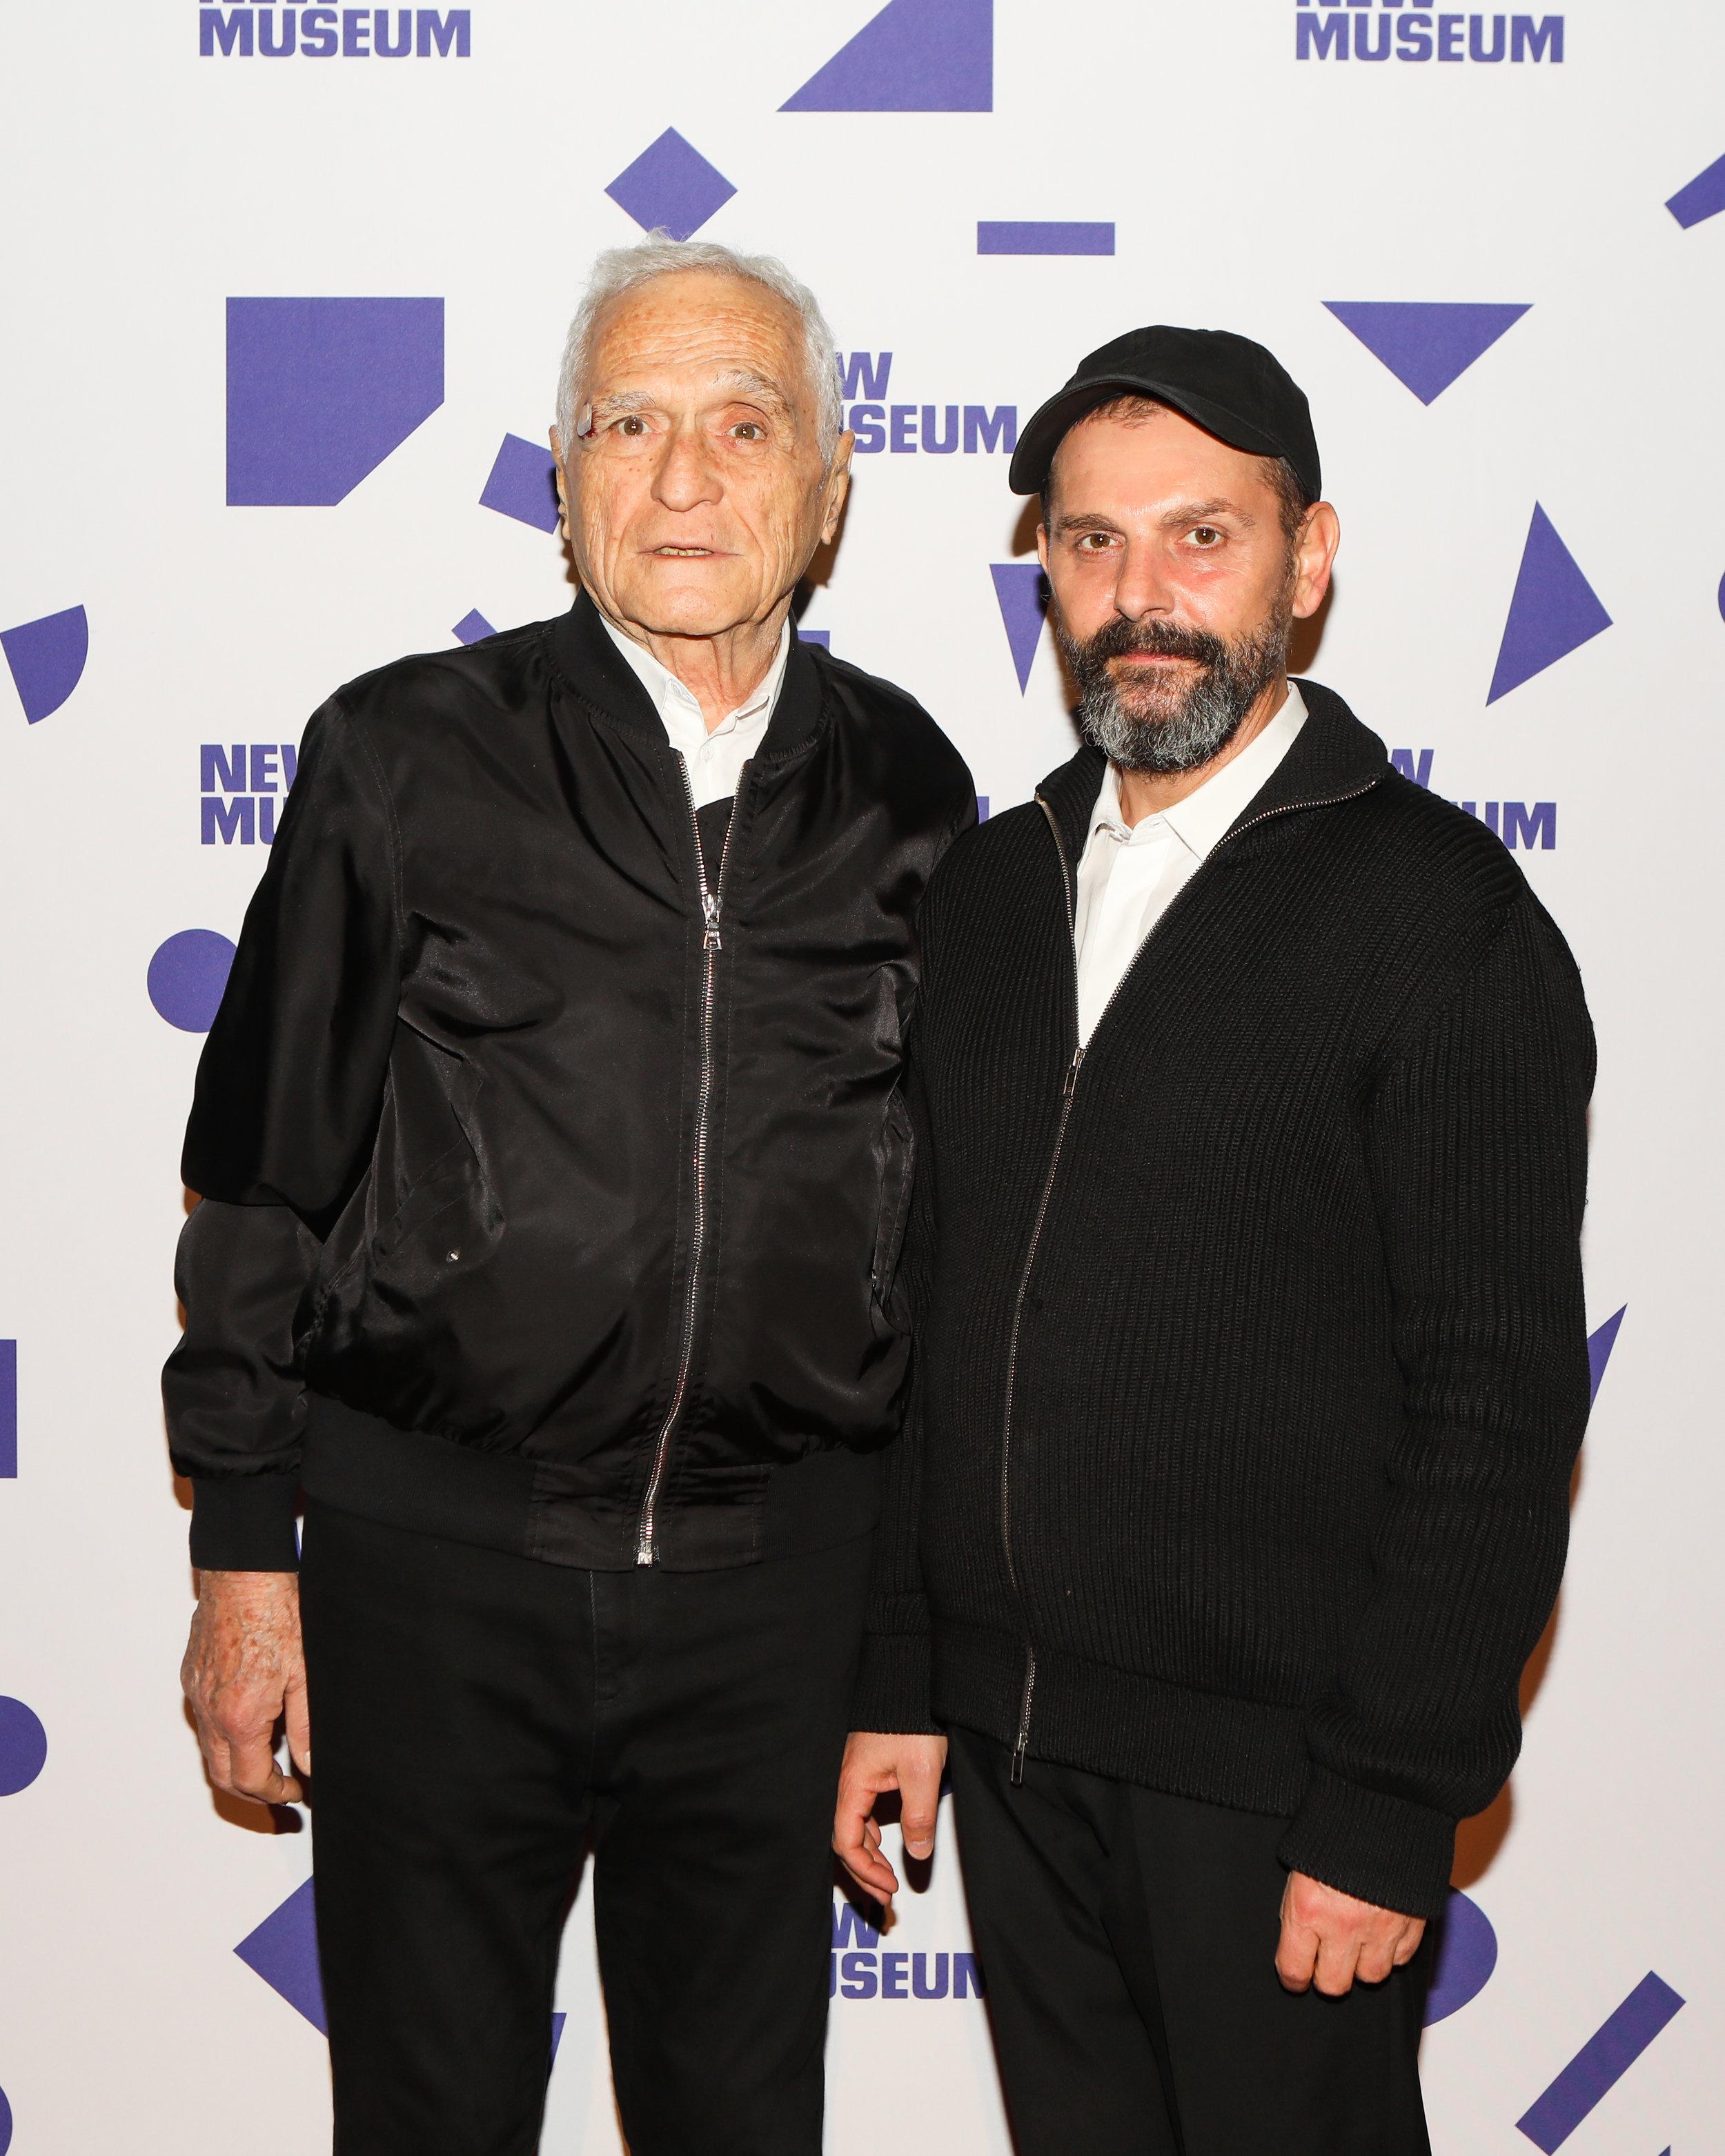 John Giorno and Ugo Rondinone